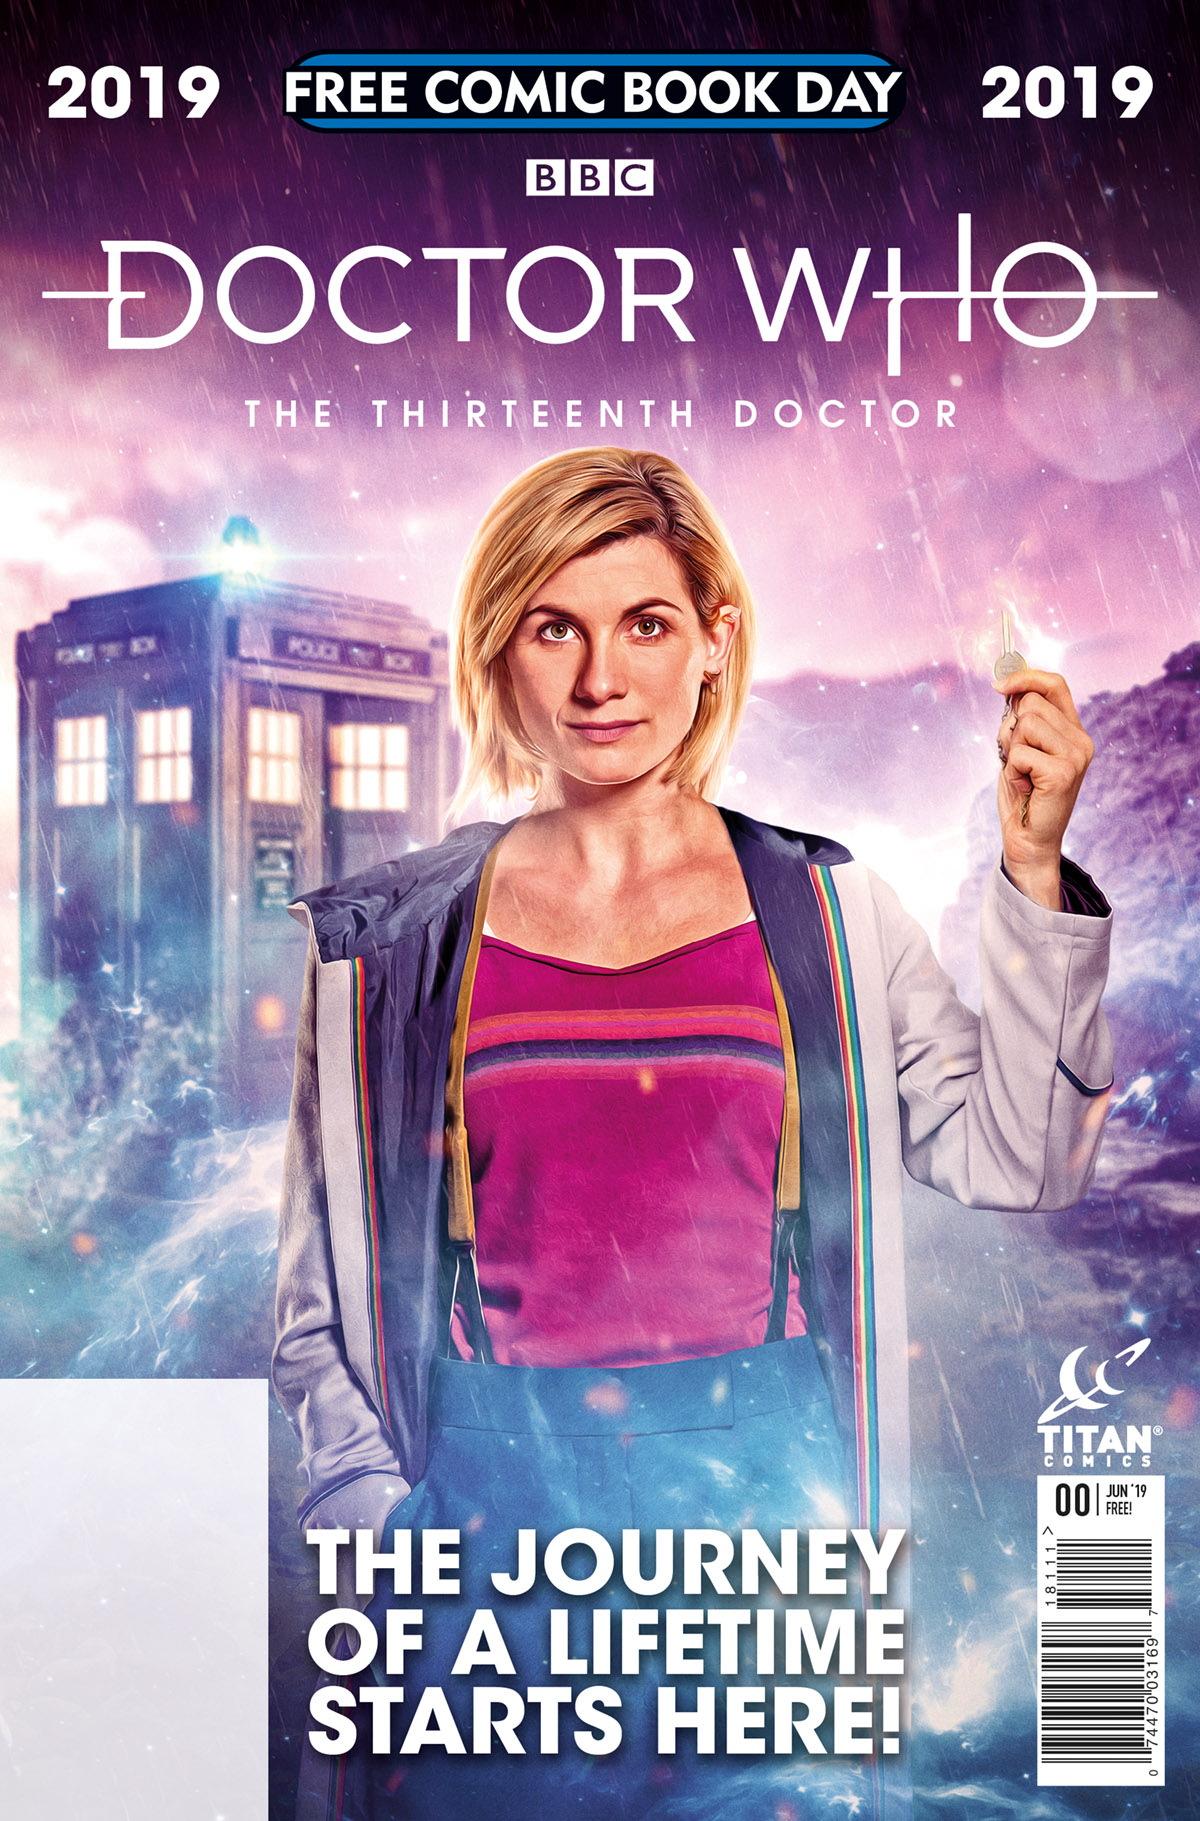 FCBD19_G_Titan Comics_Doctor Who 13th Doctor_2